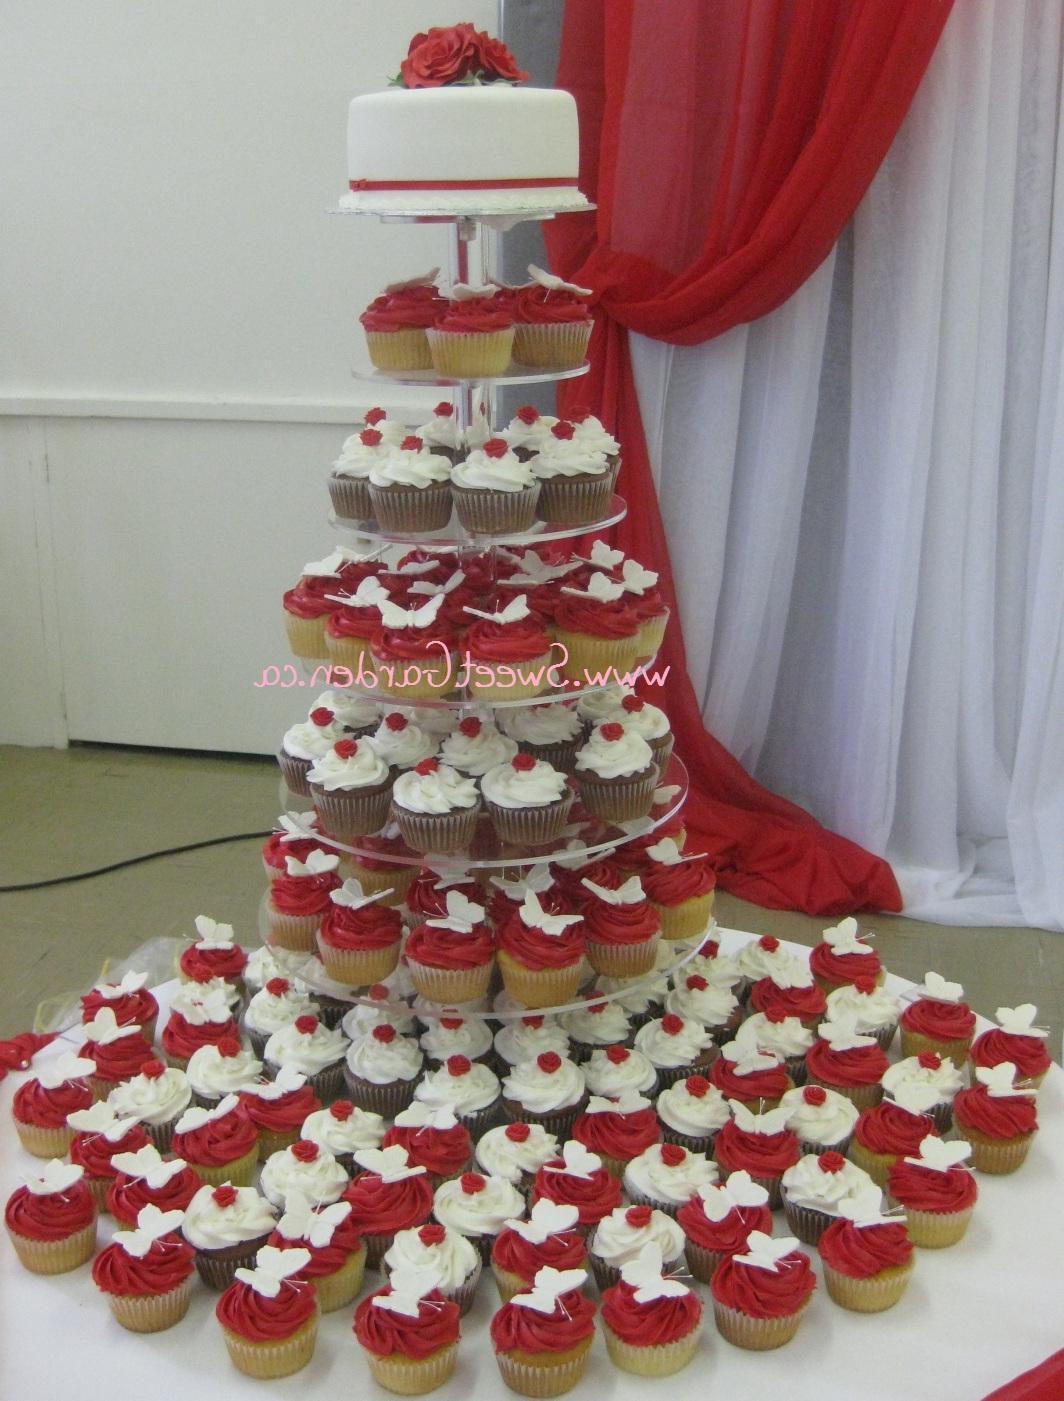 34 - Cupcake Tower